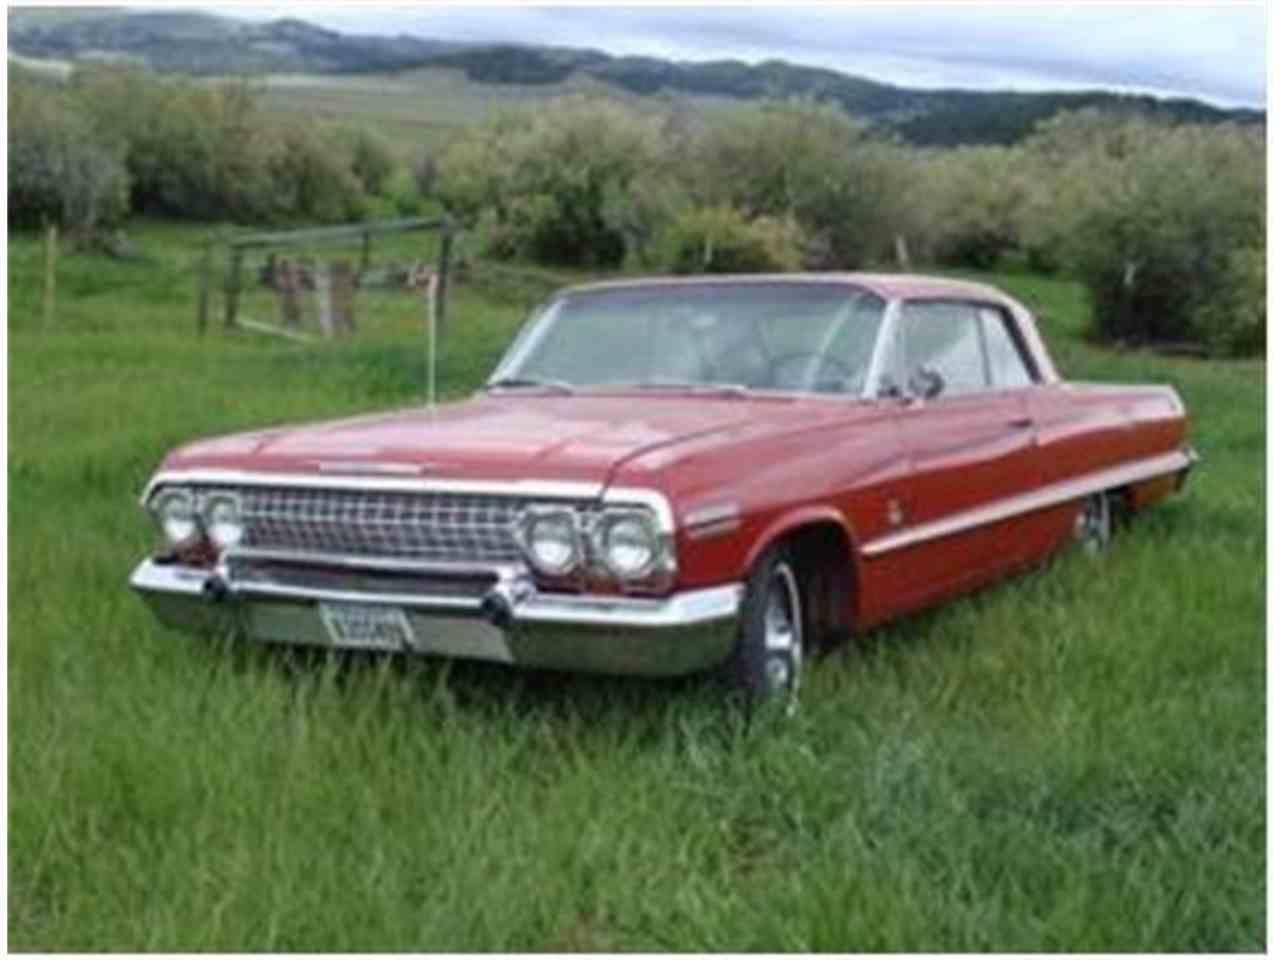 1963 chevrolet impala ss for sale cc 1019212. Black Bedroom Furniture Sets. Home Design Ideas